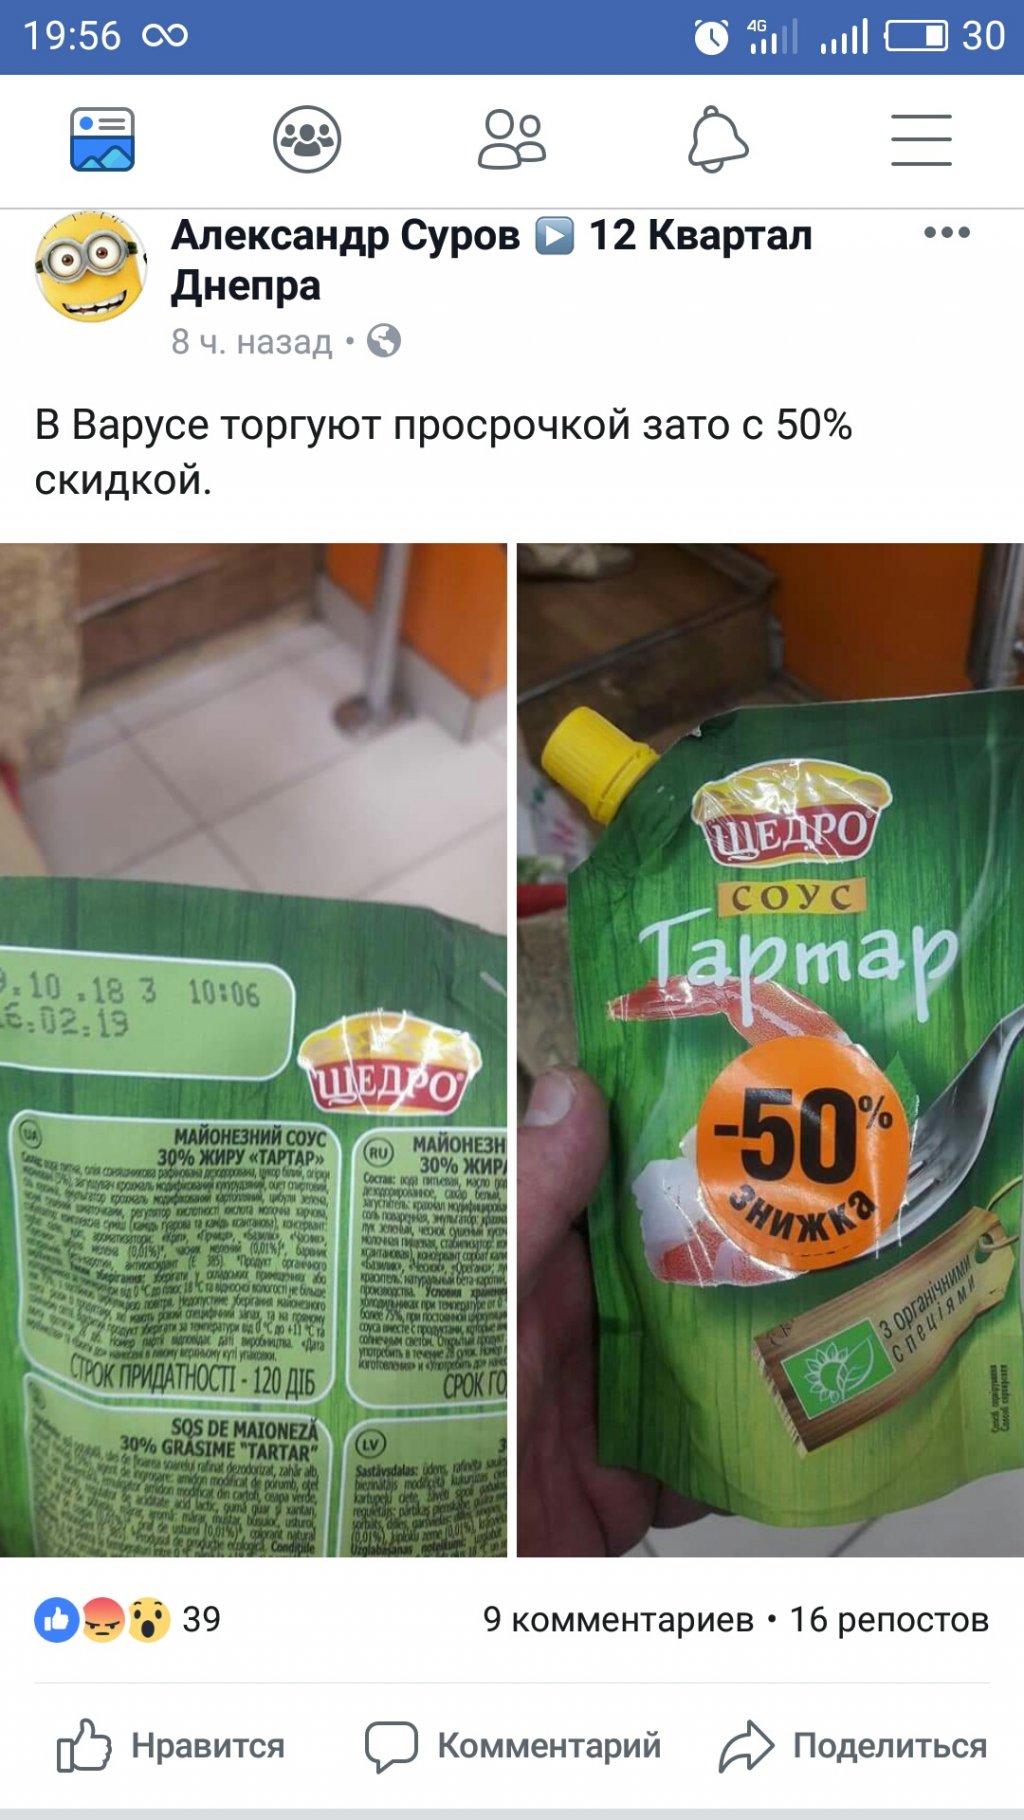 Varus market, Днепропетровск - Varus Днепр 12 квартал